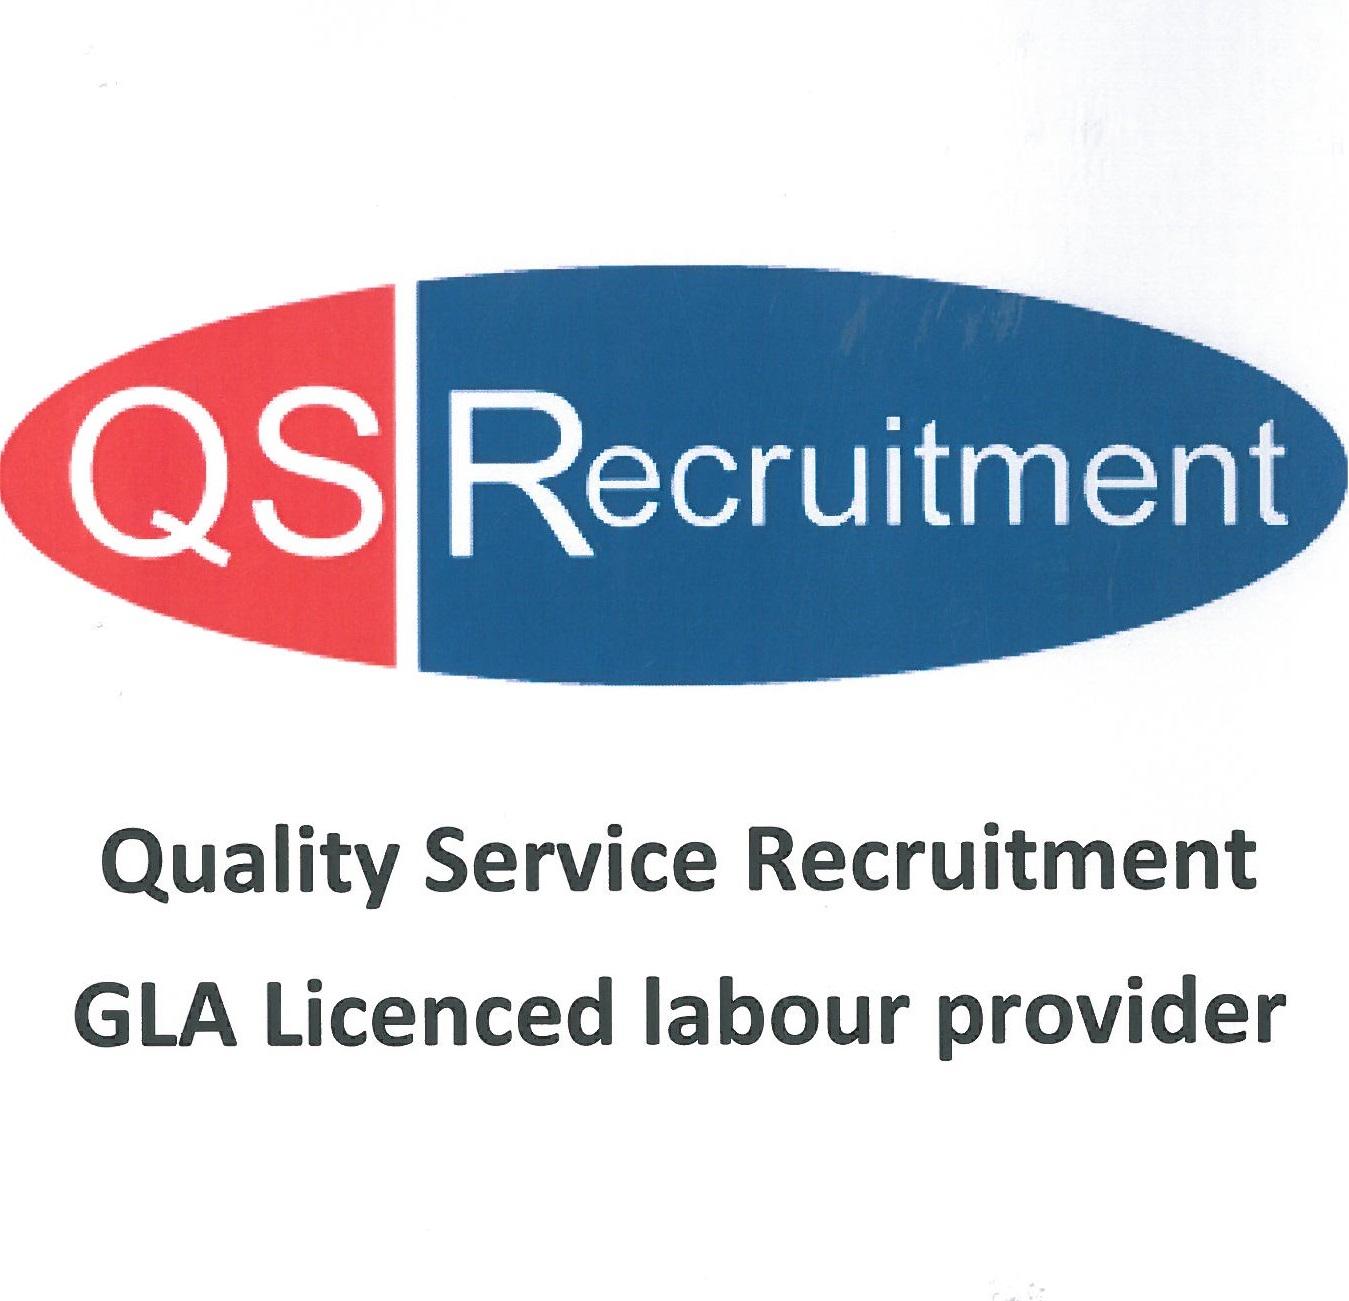 QS Recruitment GLA licenced labour provider